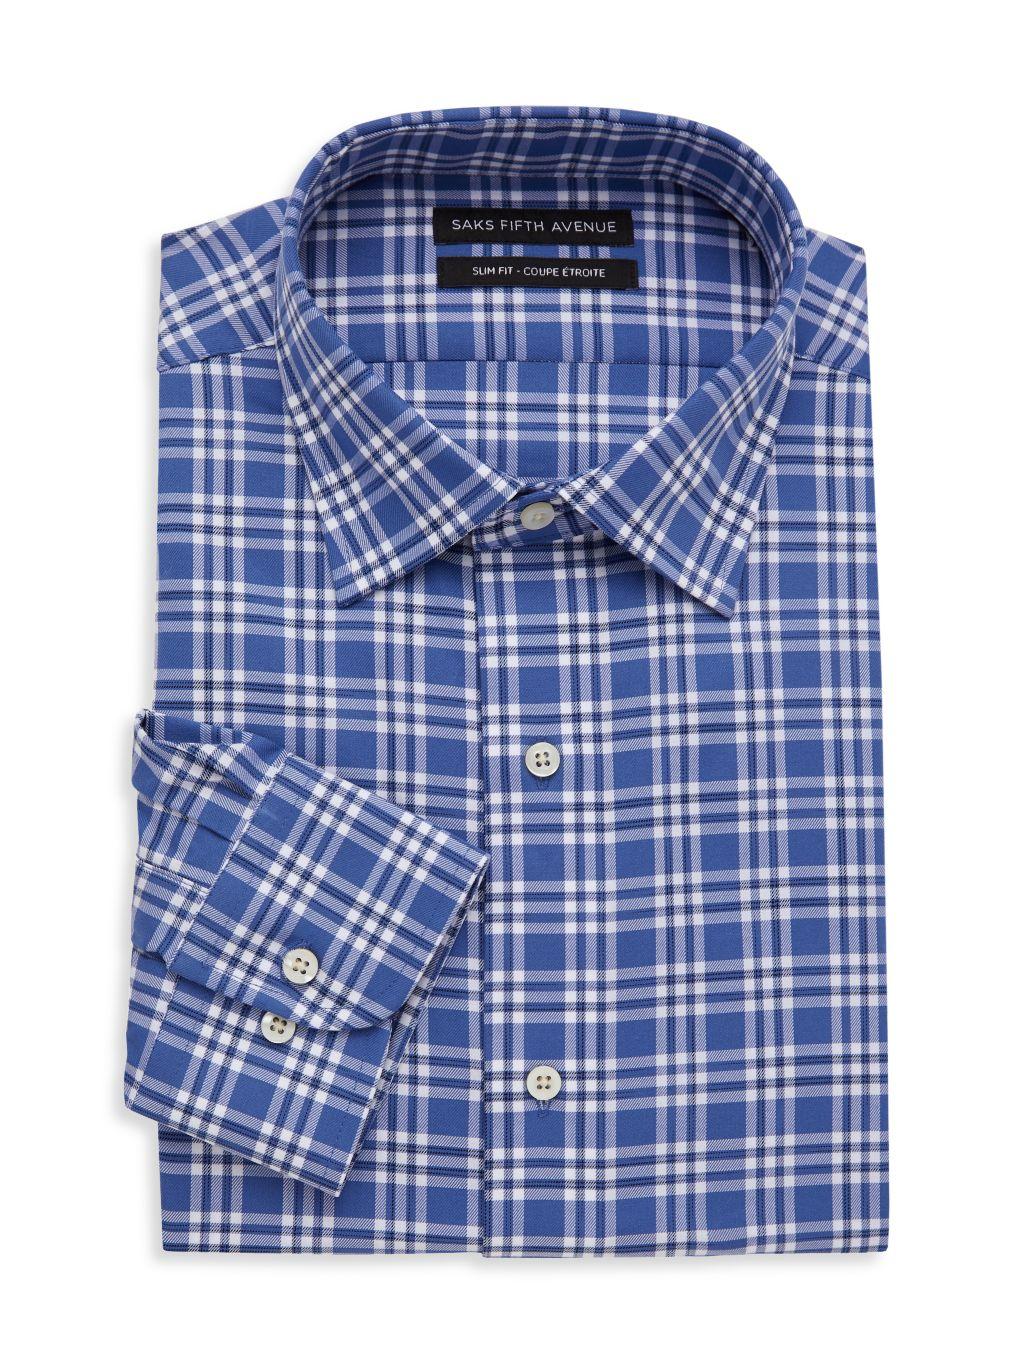 Saks Fifth Avenue Slim-Fit Plaid Dress Shirt